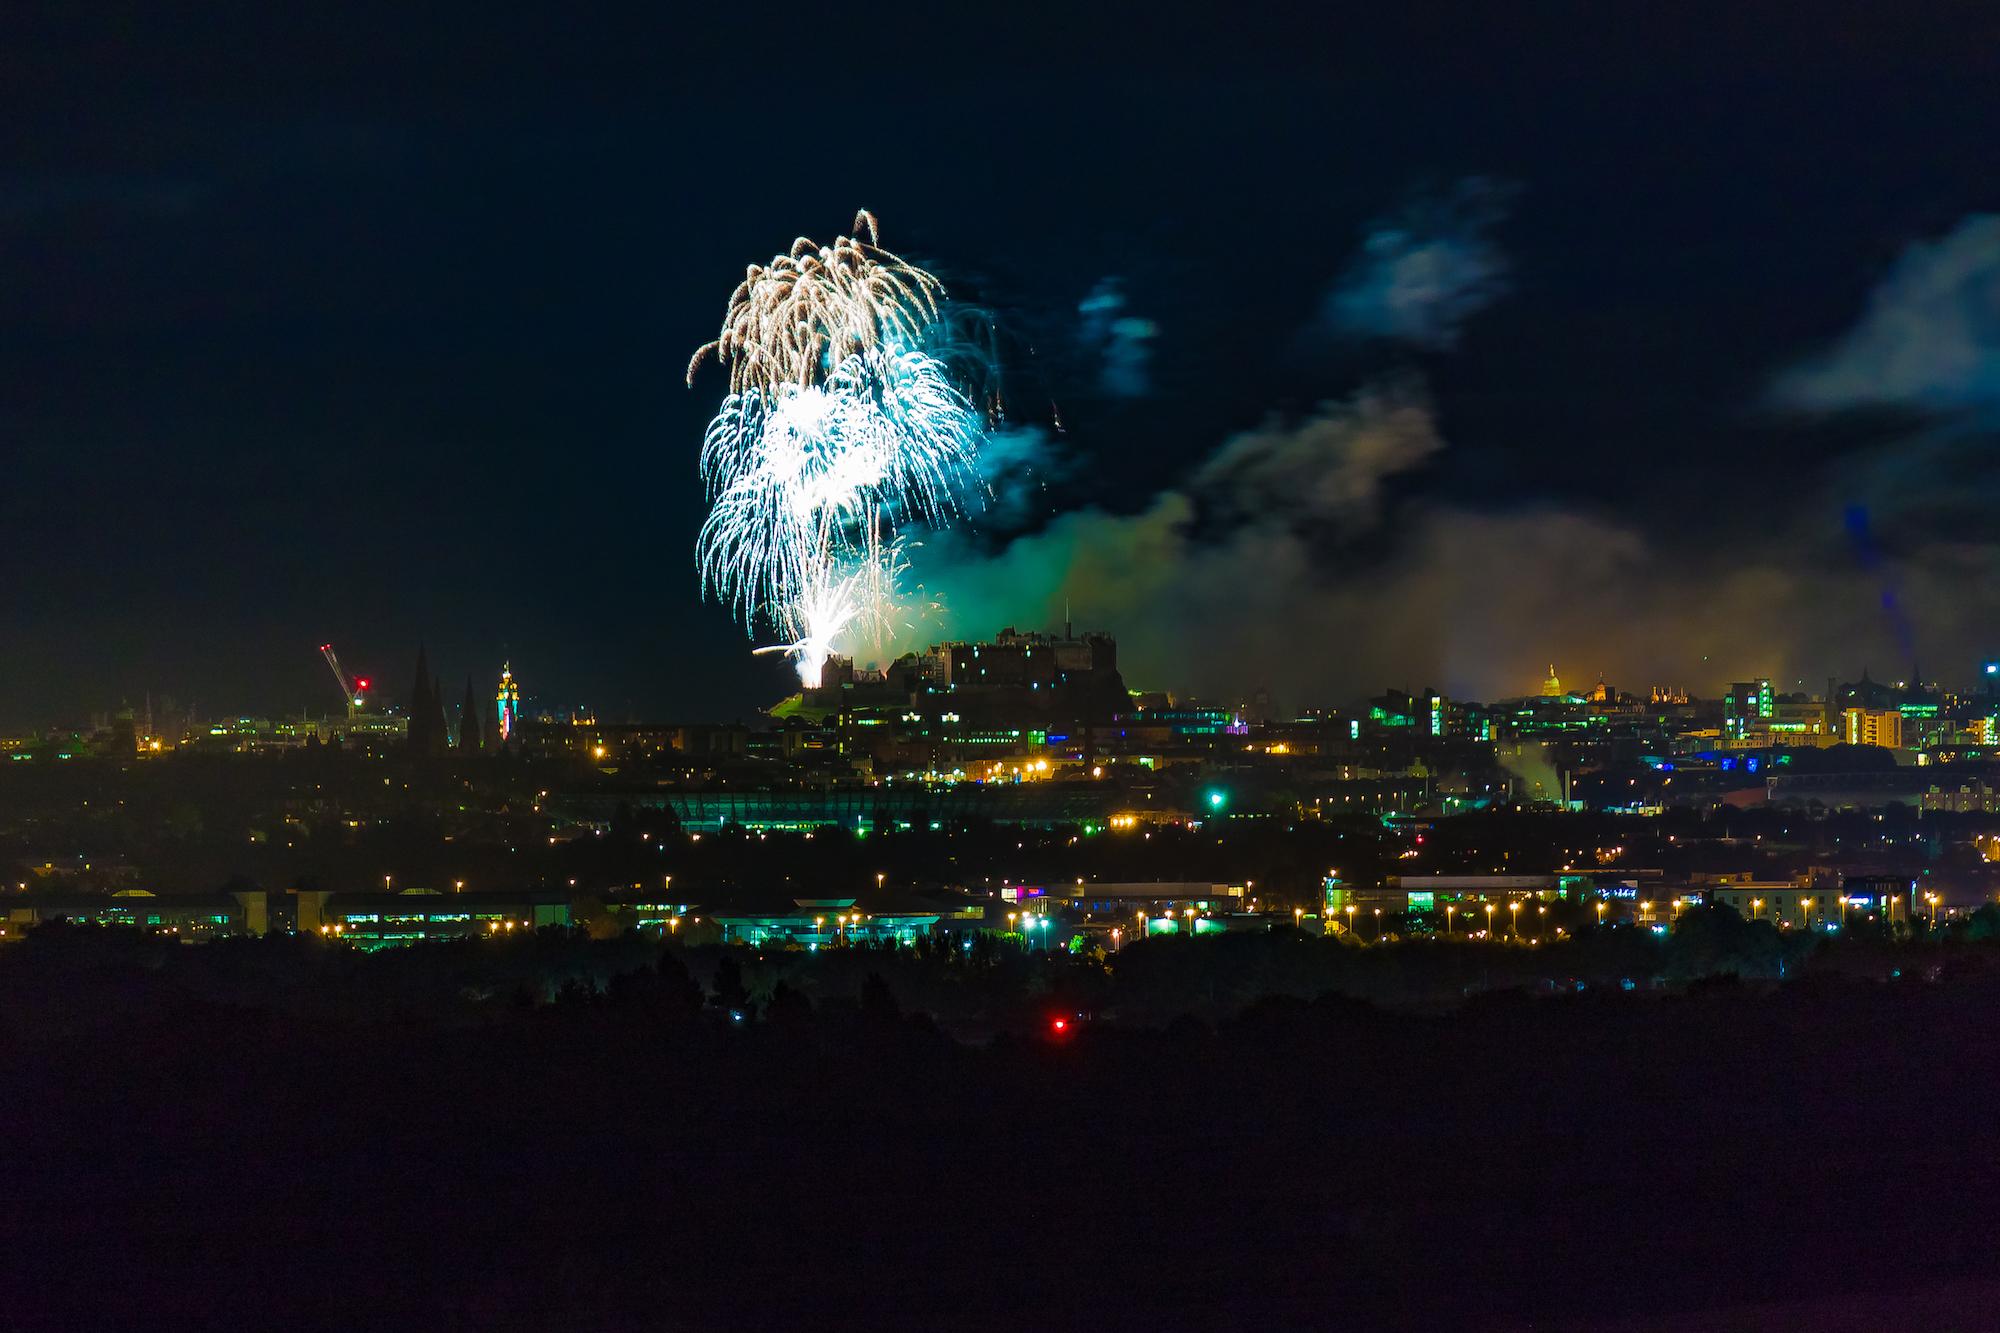 (170) Edinburgh Festival Fireworks Finale, August 2015, Scotland.jpg